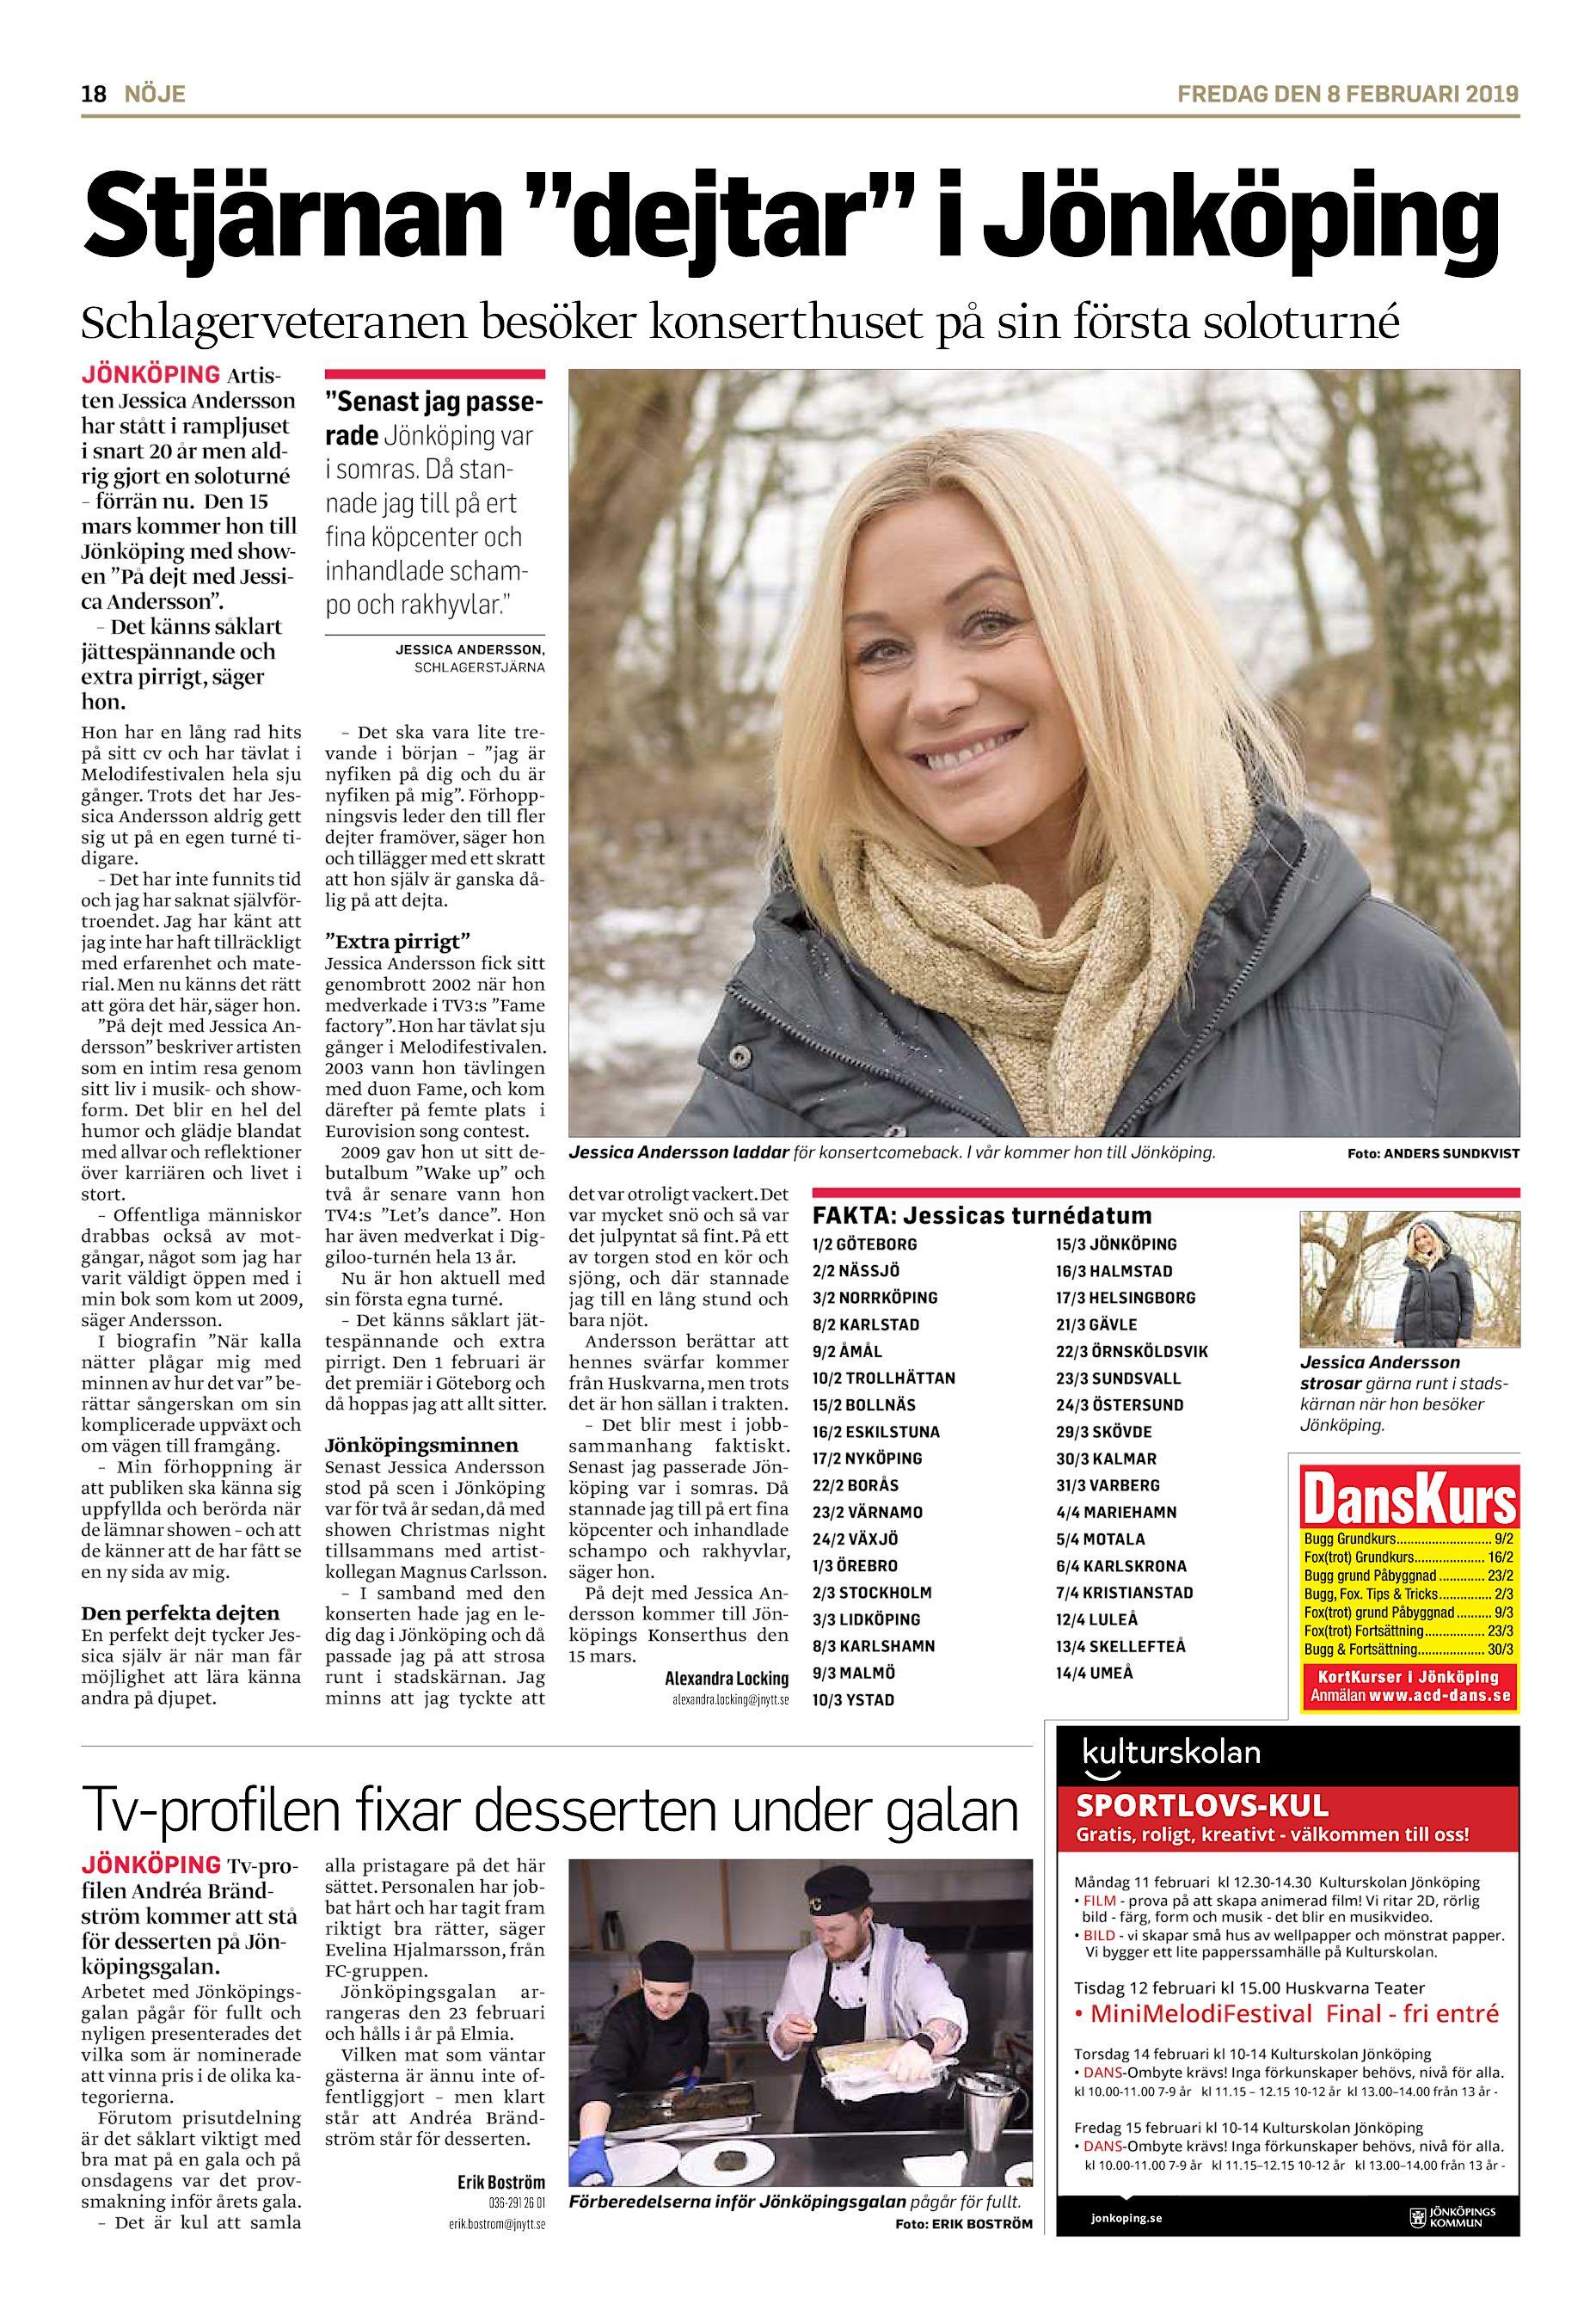 Sylvana Adolfsson, Sgverksvgen 2, Hok | satisfaction-survey.net